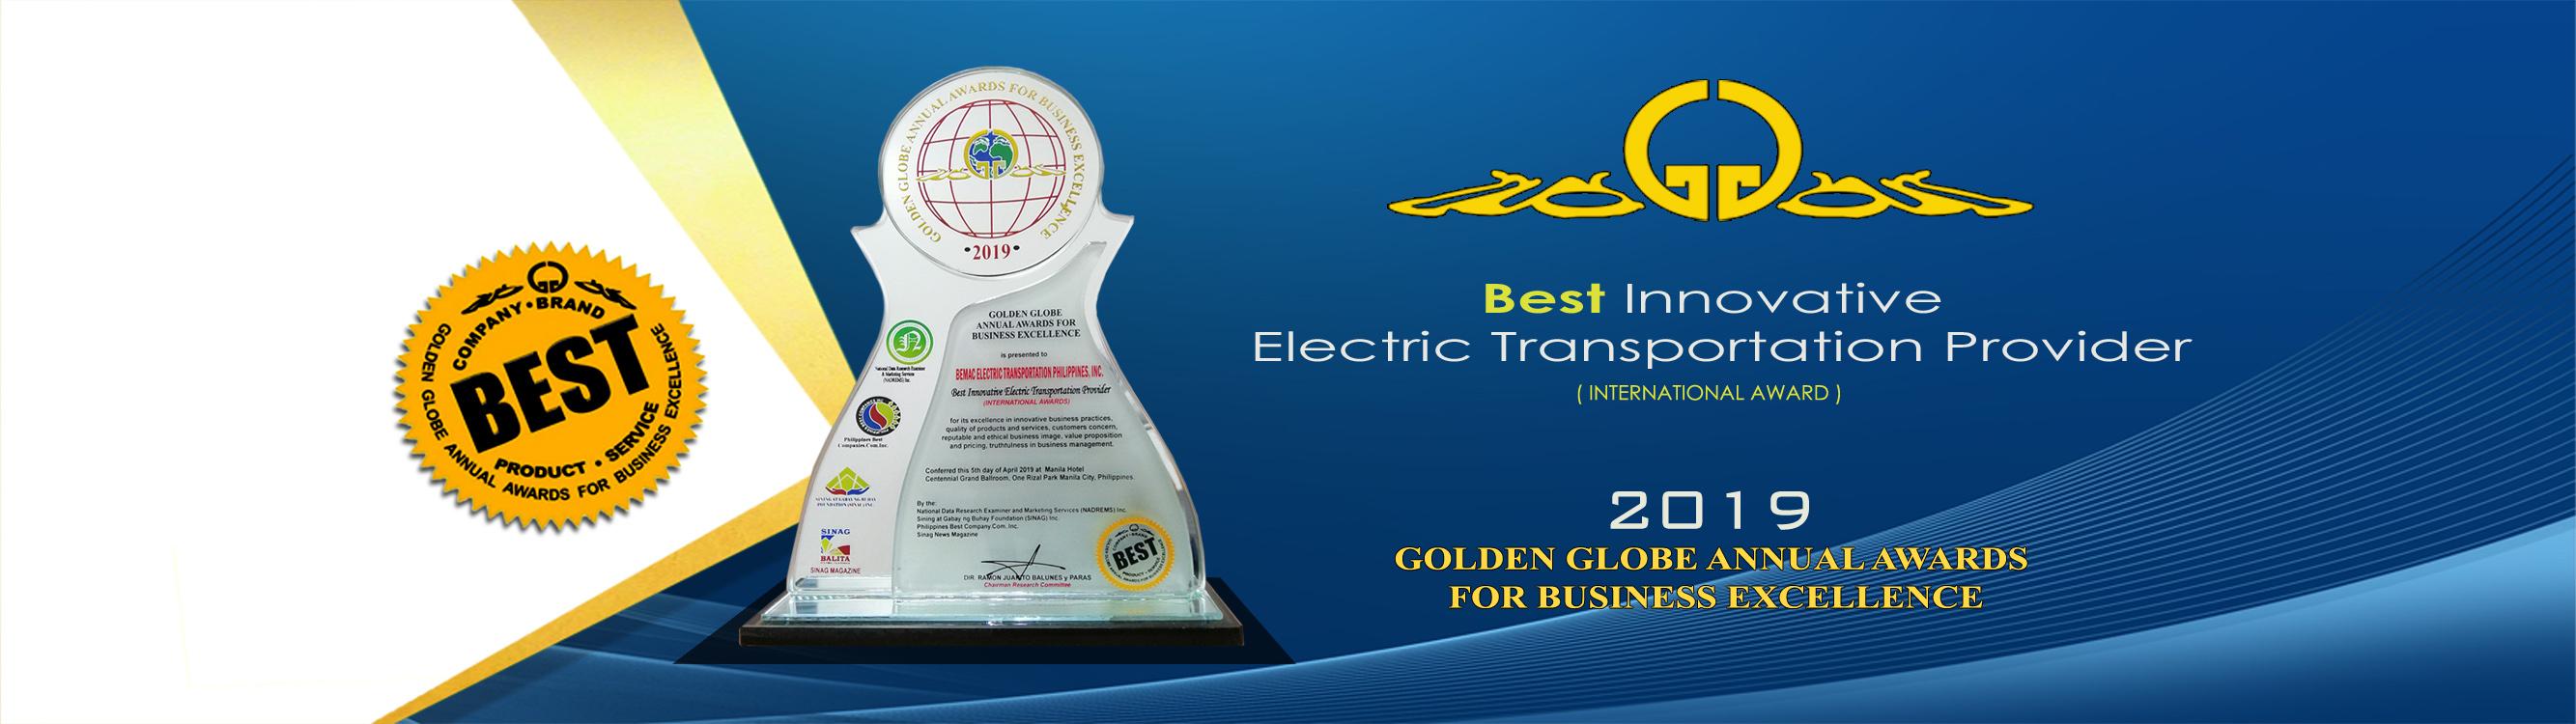 golden-globe20191